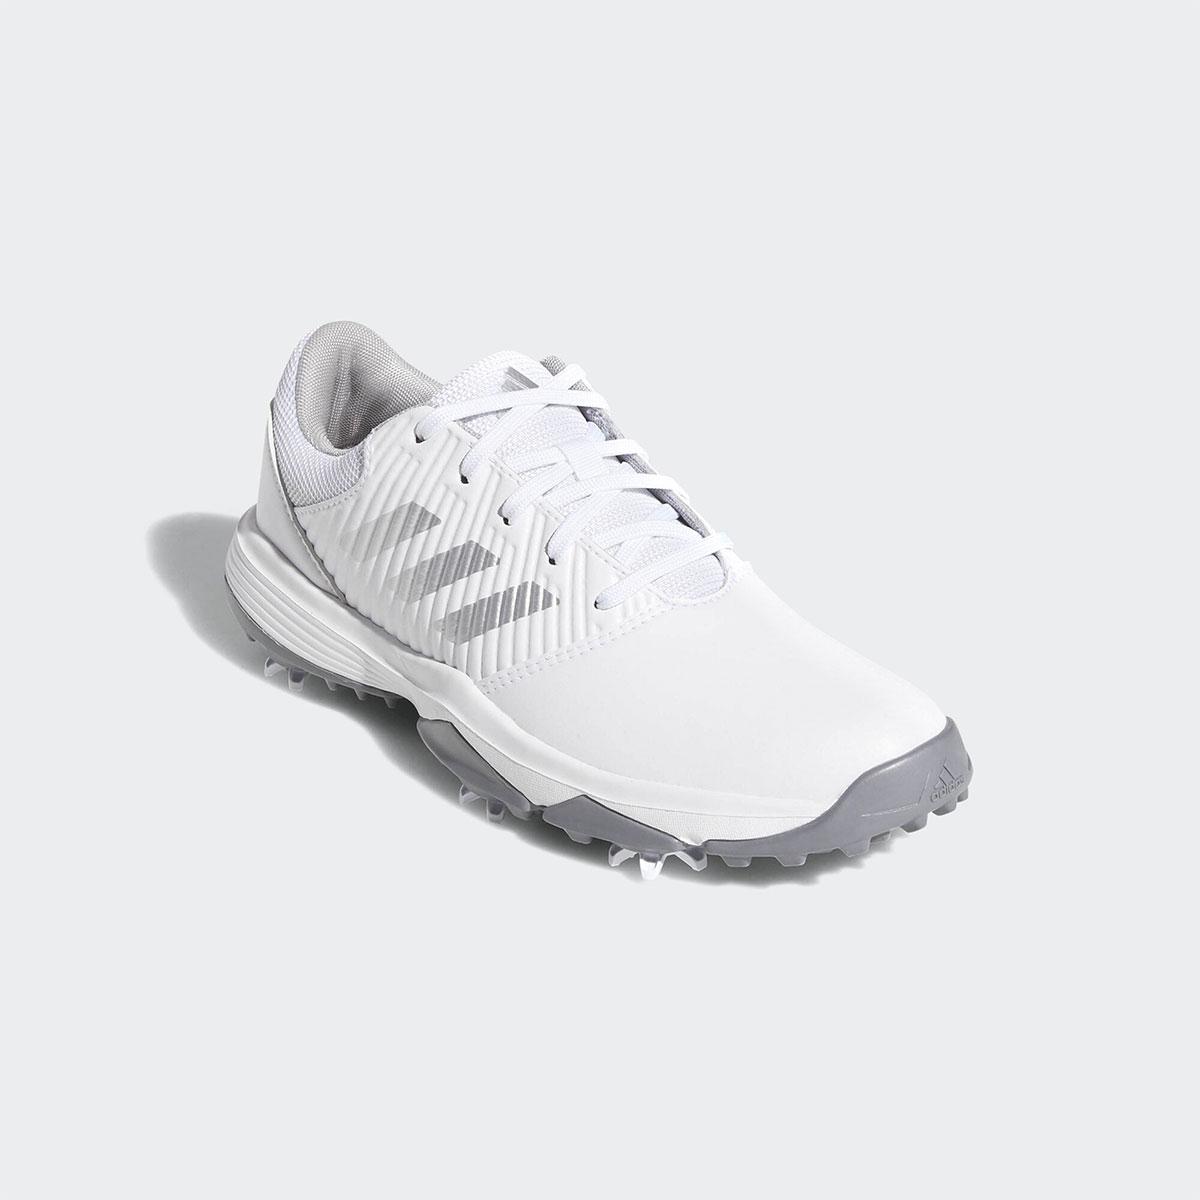 official photos 8ad83 1a902 adidas Golf CP Traxion Junior Shoes